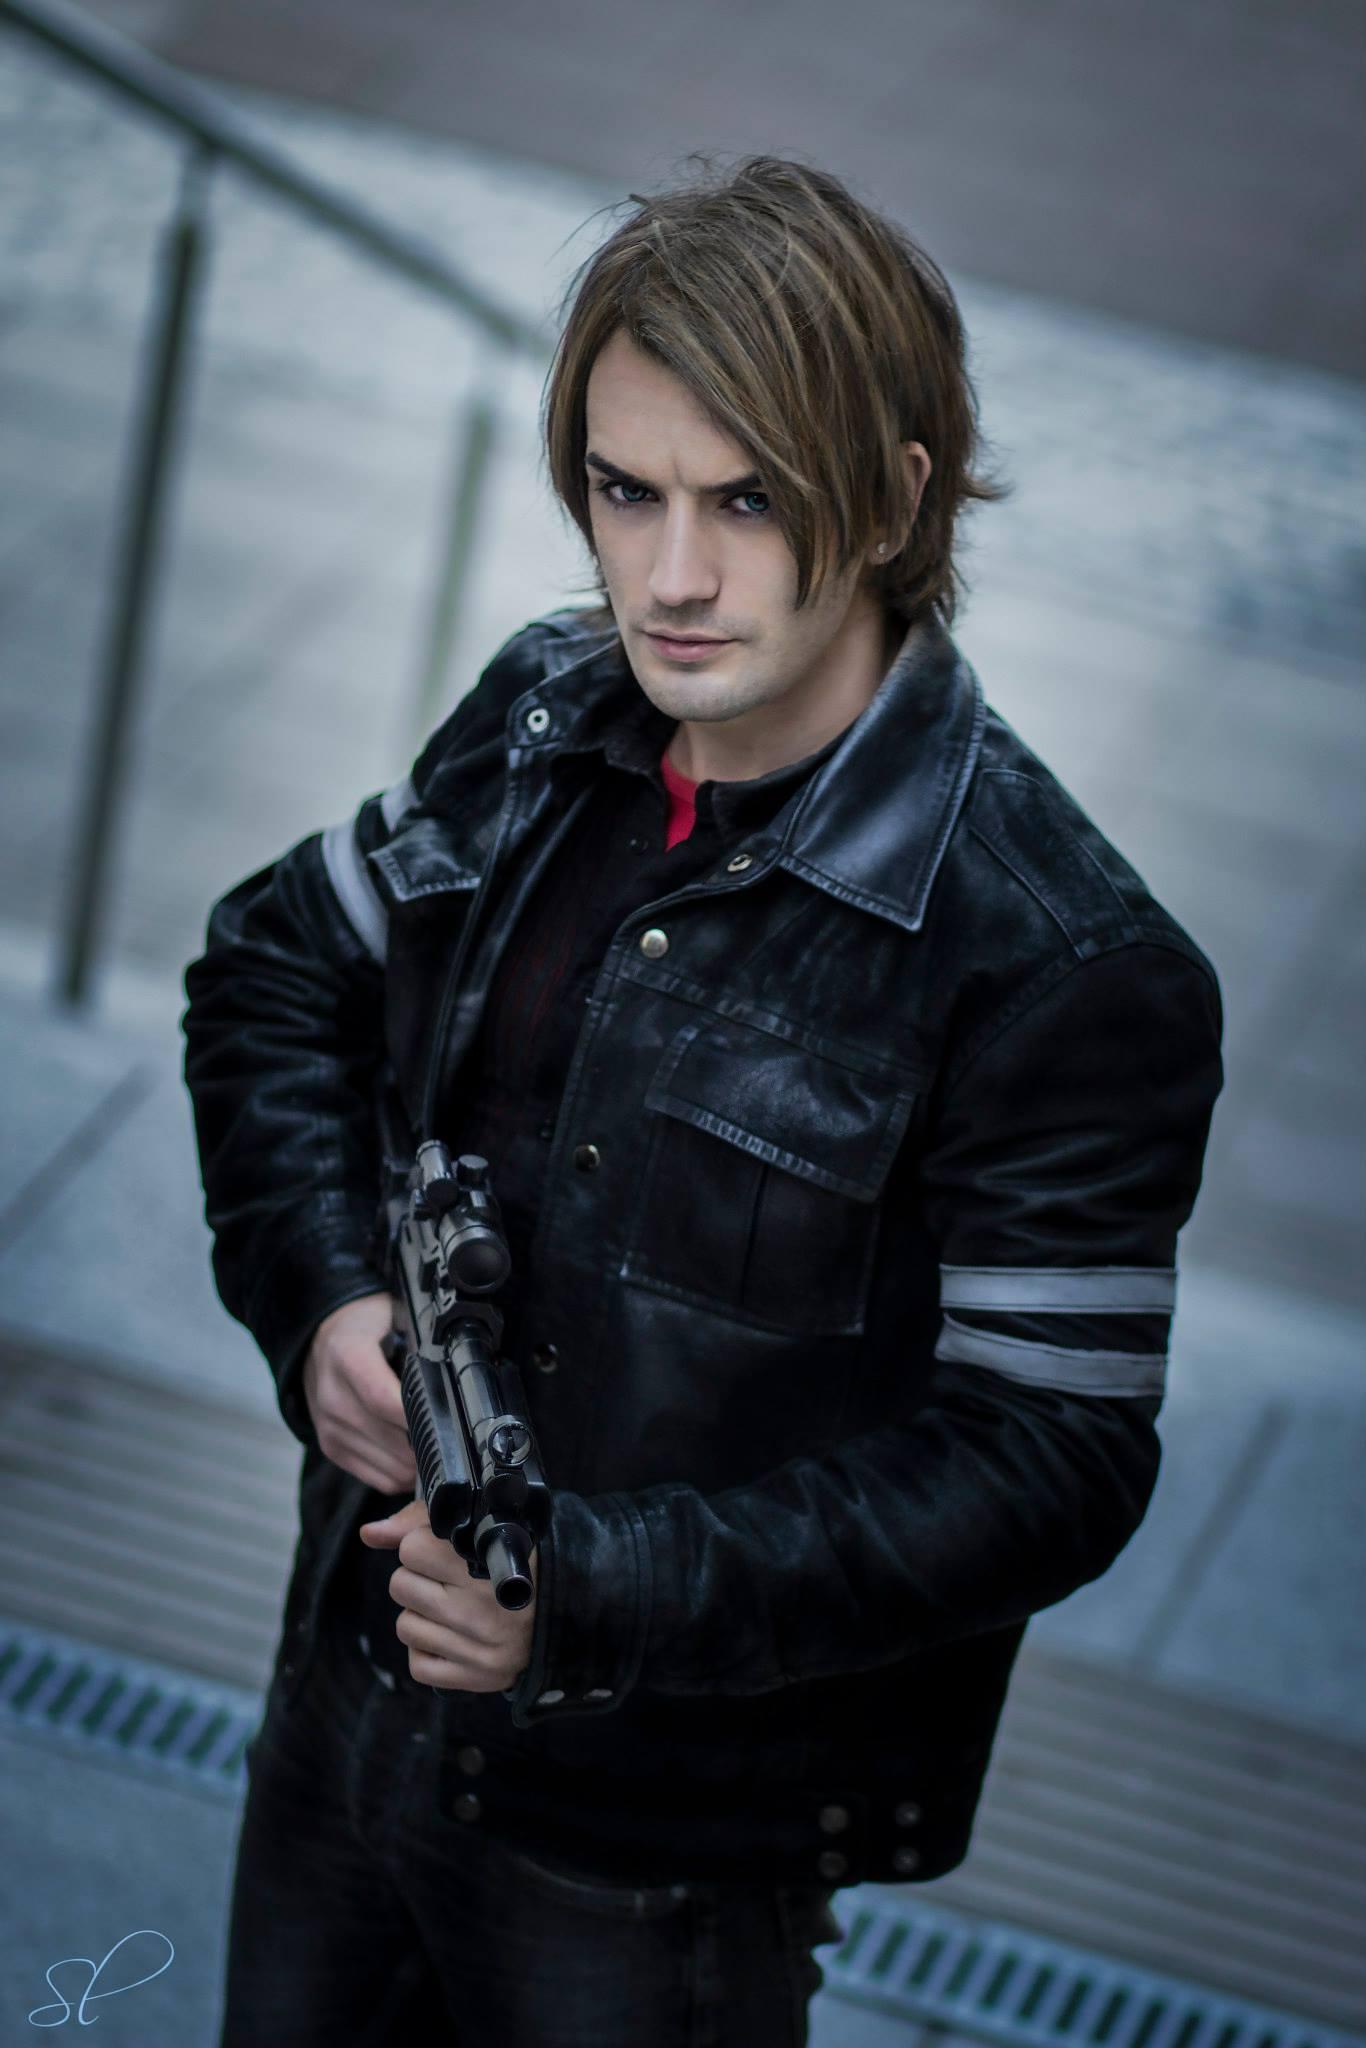 Resident Evil 7 - Leon Chiro cosplay